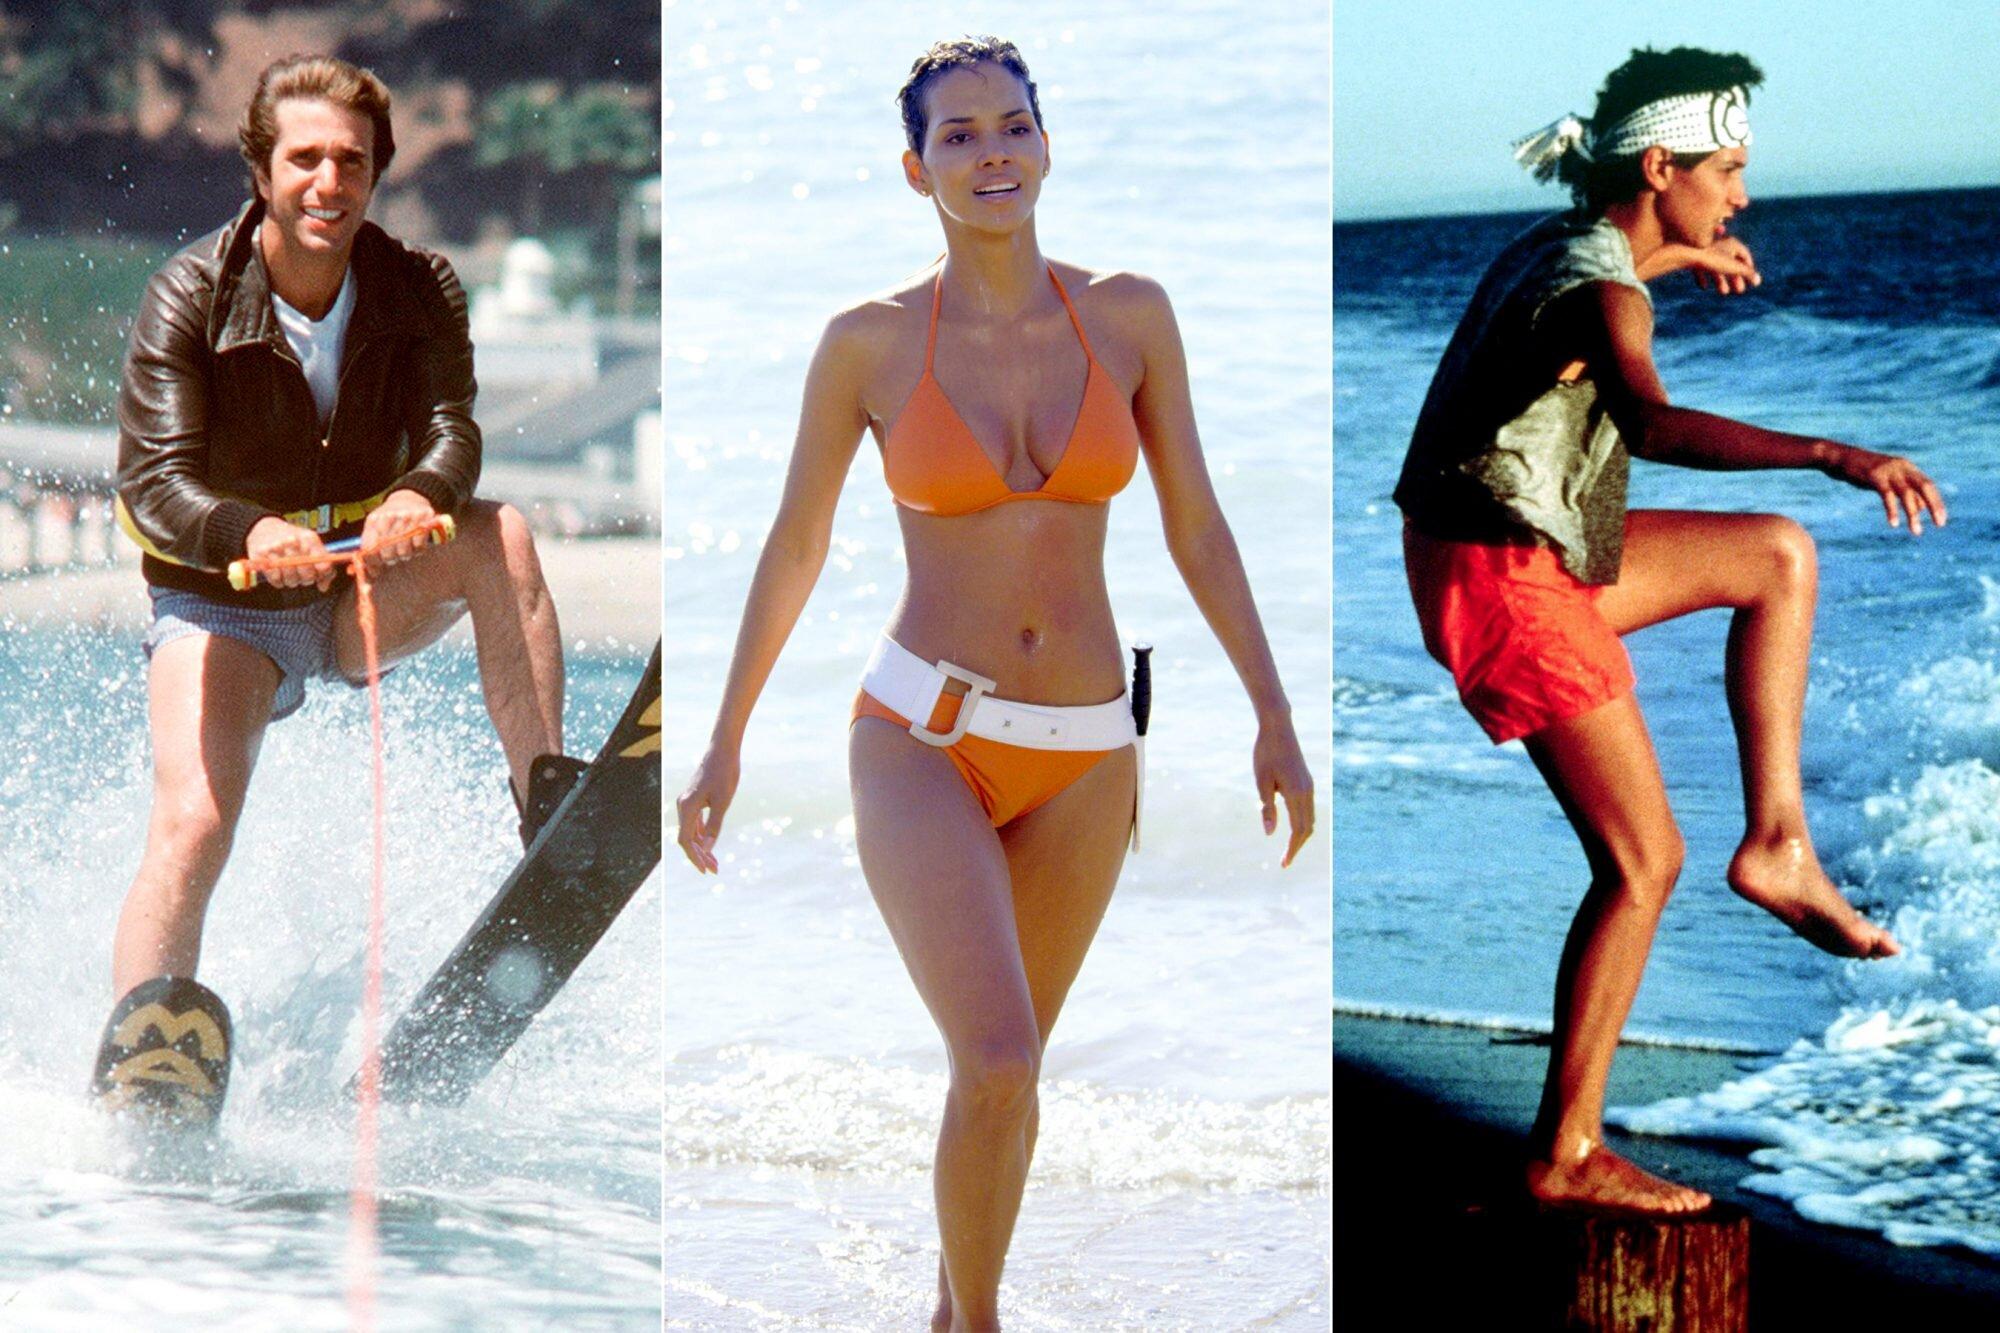 All American Bikini Wash Car Full Movie the 25 best beach scenes from movies and tv | ew